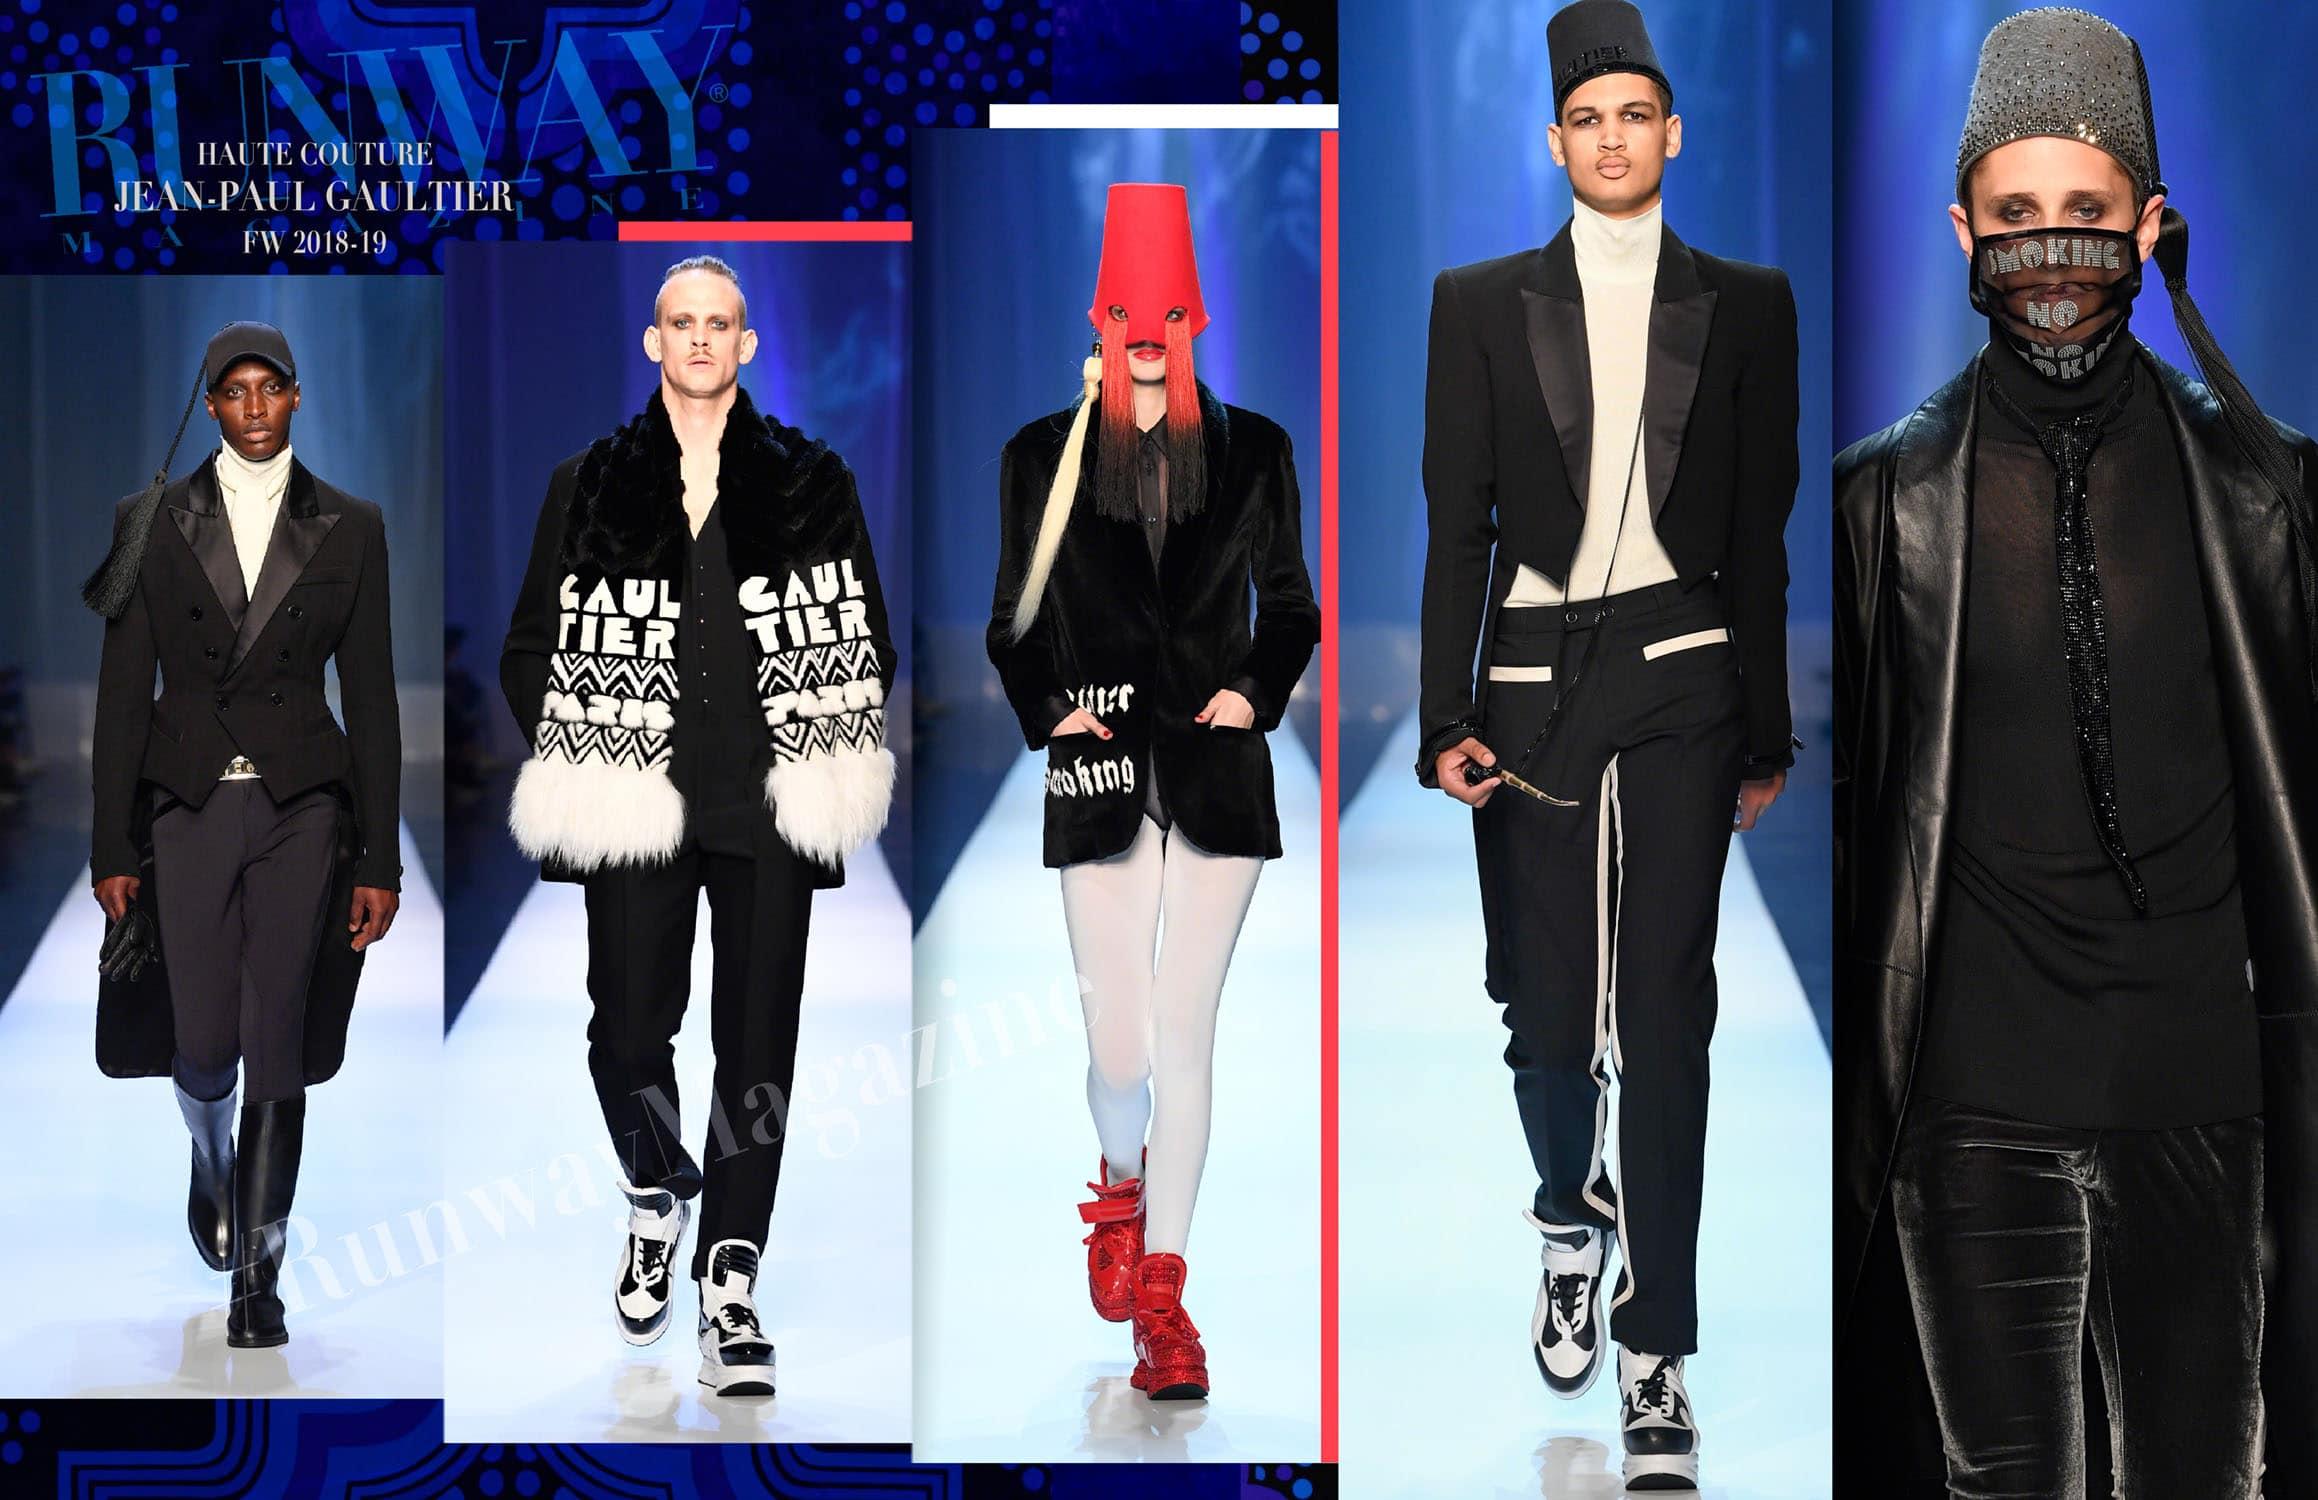 Jean Paul Gaultier Haute Couture Fall-Winter 2018-19 Paris Fashion Week by RUNWAY MAGAZINE